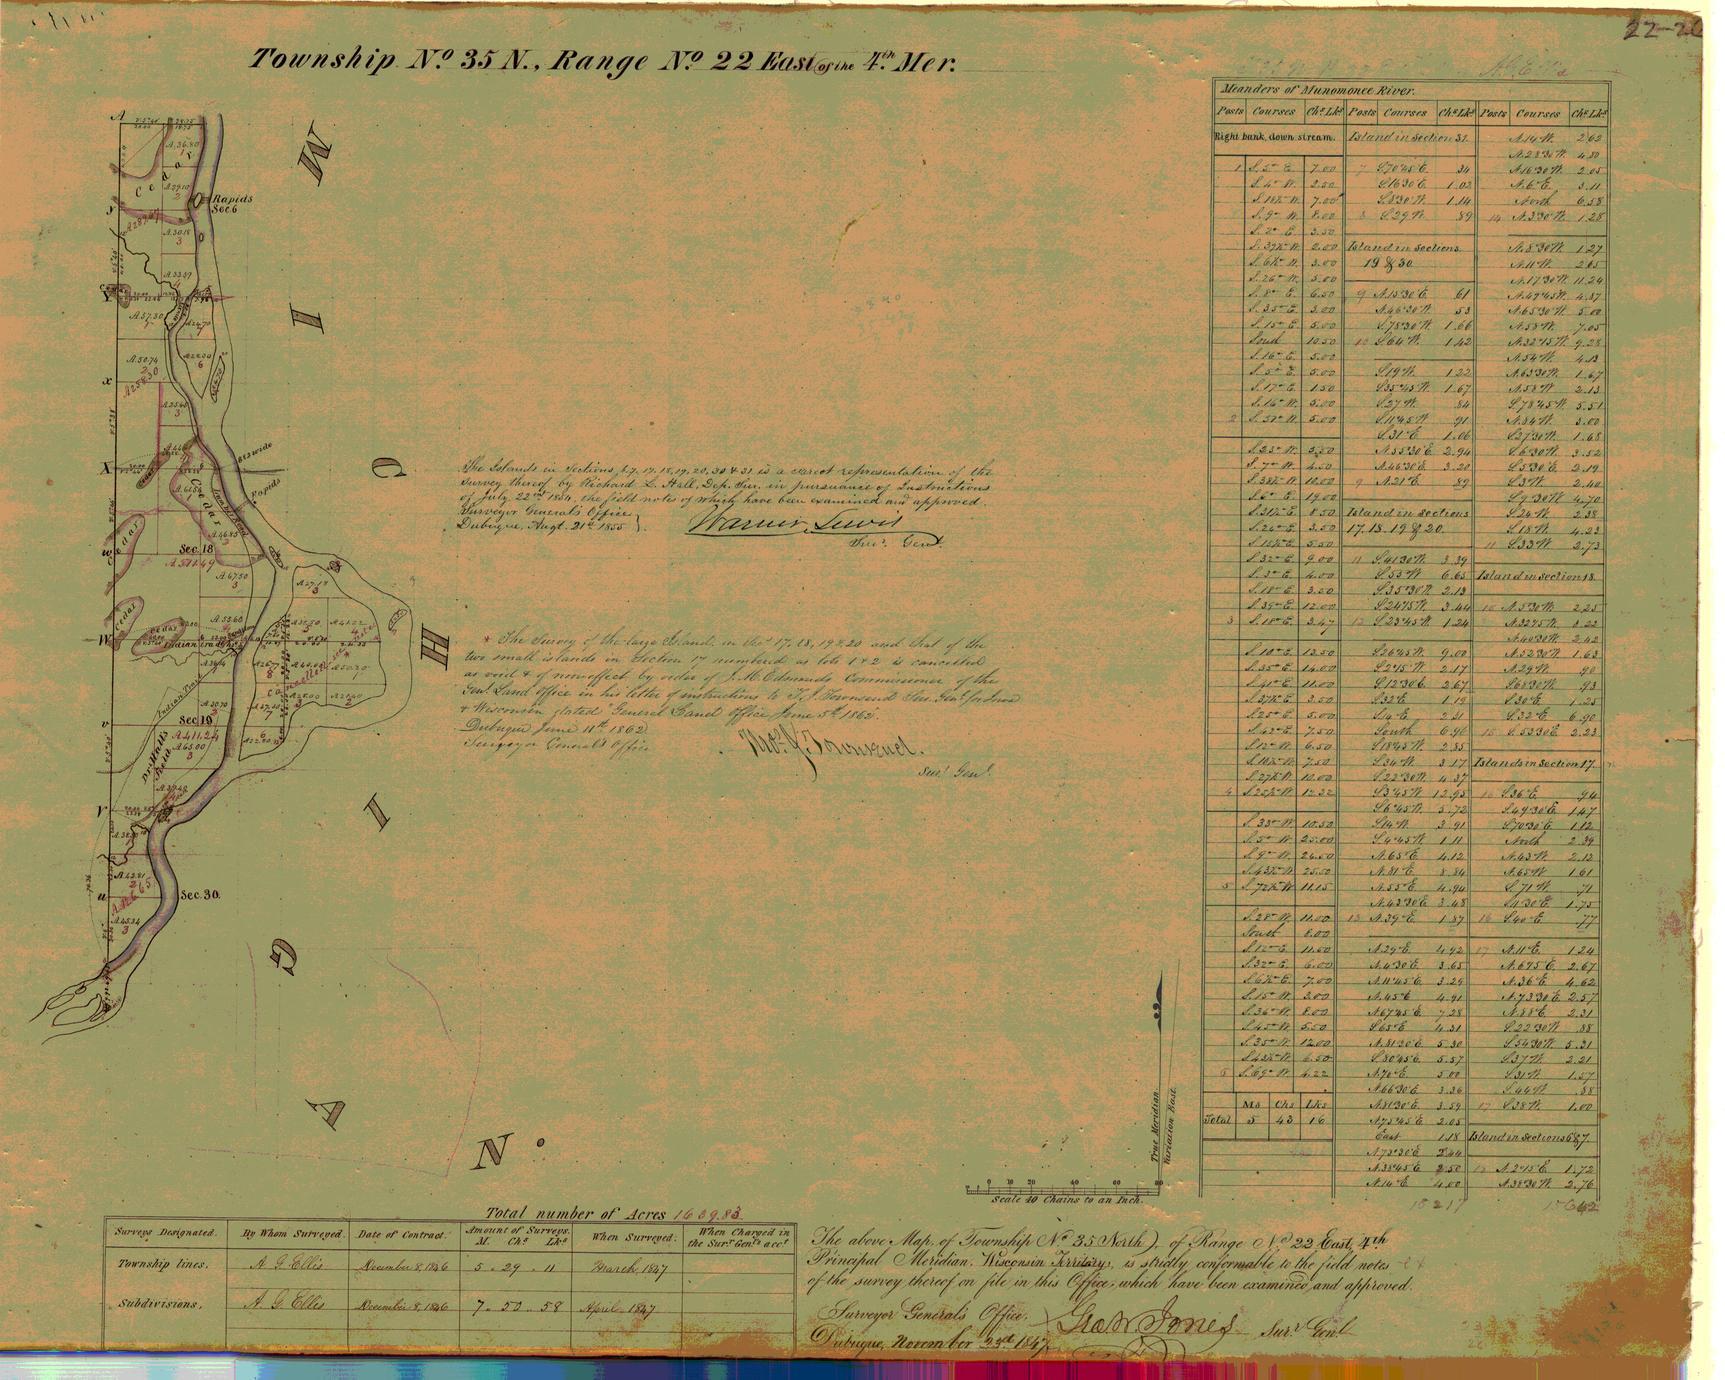 [Public Land Survey System map: Wisconsin Township 35 North, Range 22 East]